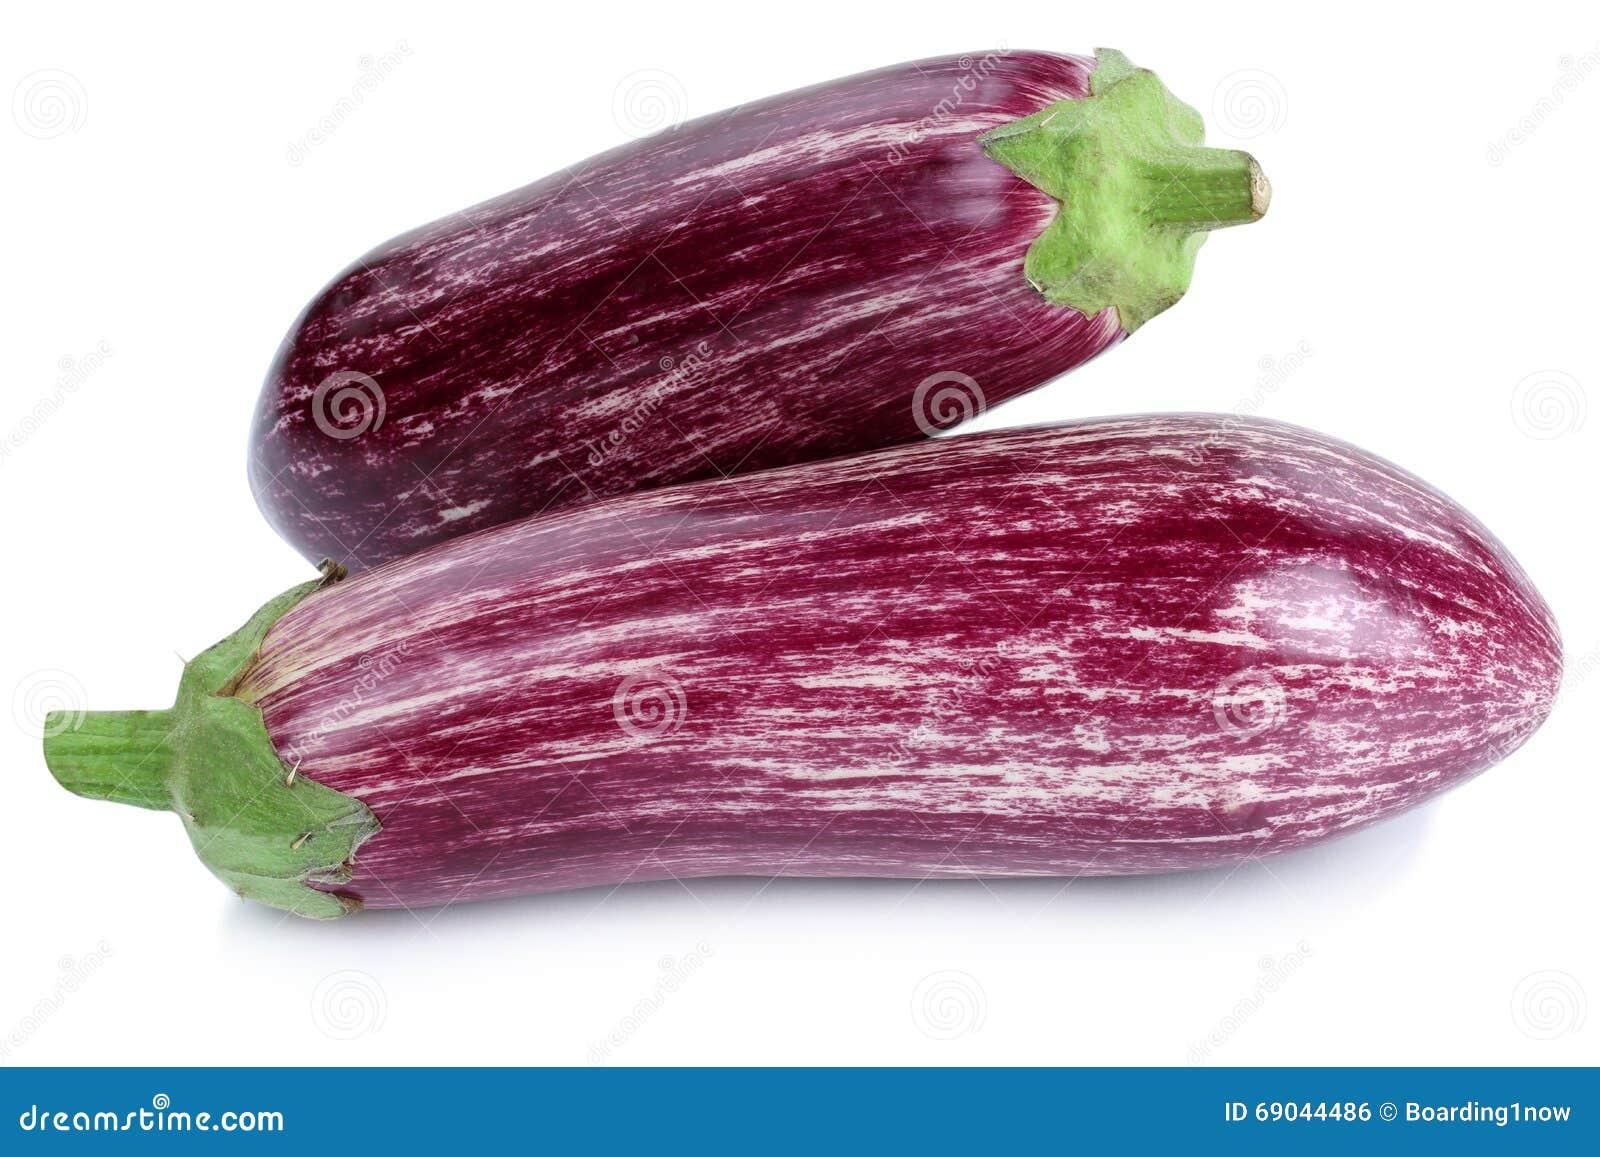 Graffiti eggplant eggplants aubergine vegetable isolated on a white background